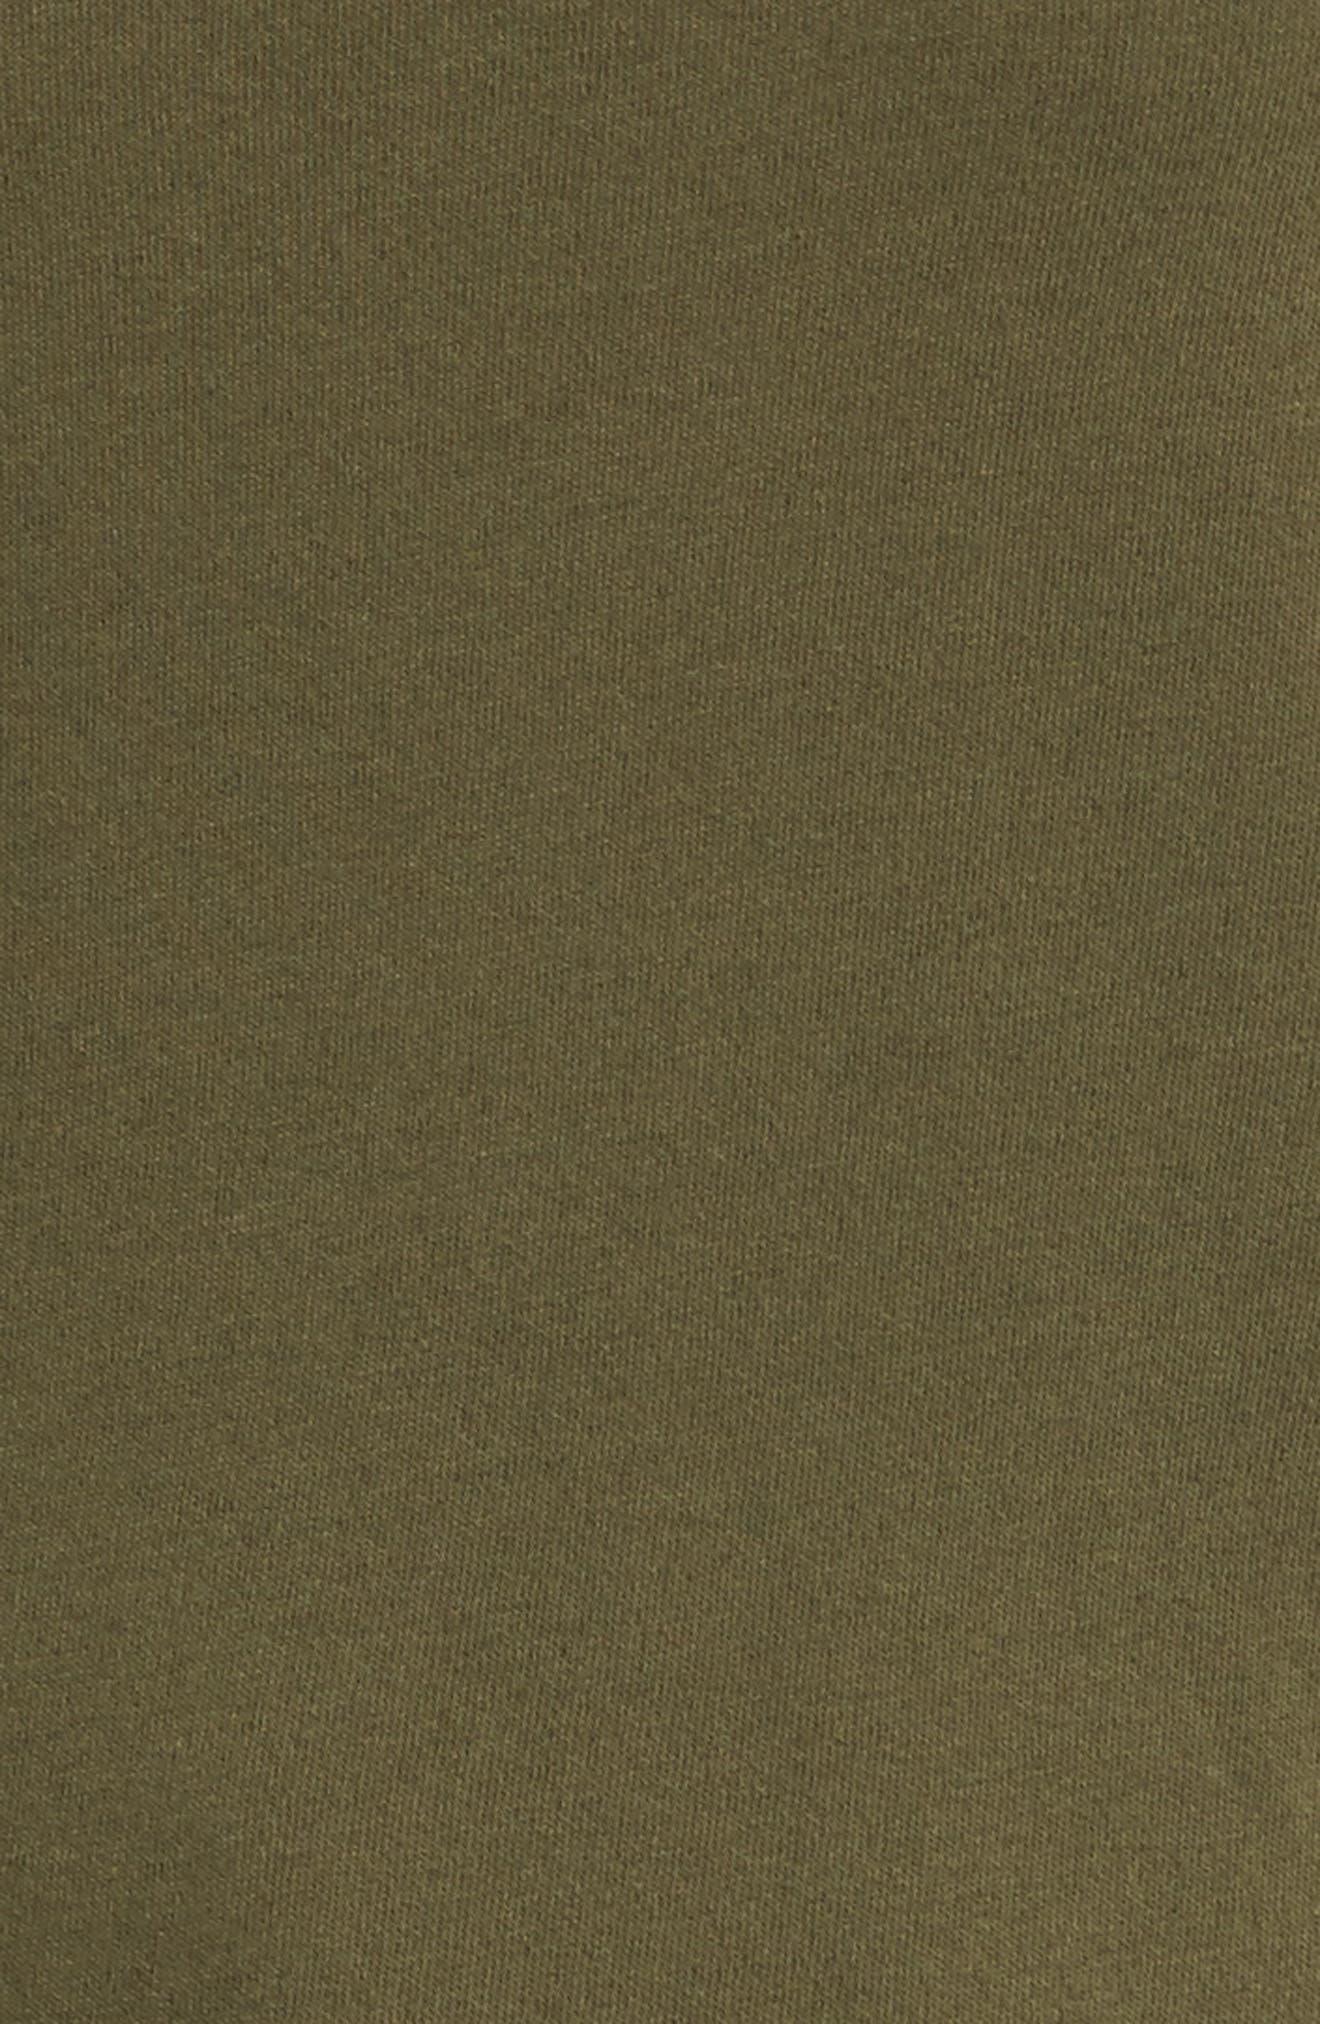 Distressed Fleece Turtleneck Sweatshirt,                             Alternate thumbnail 5, color,                             317